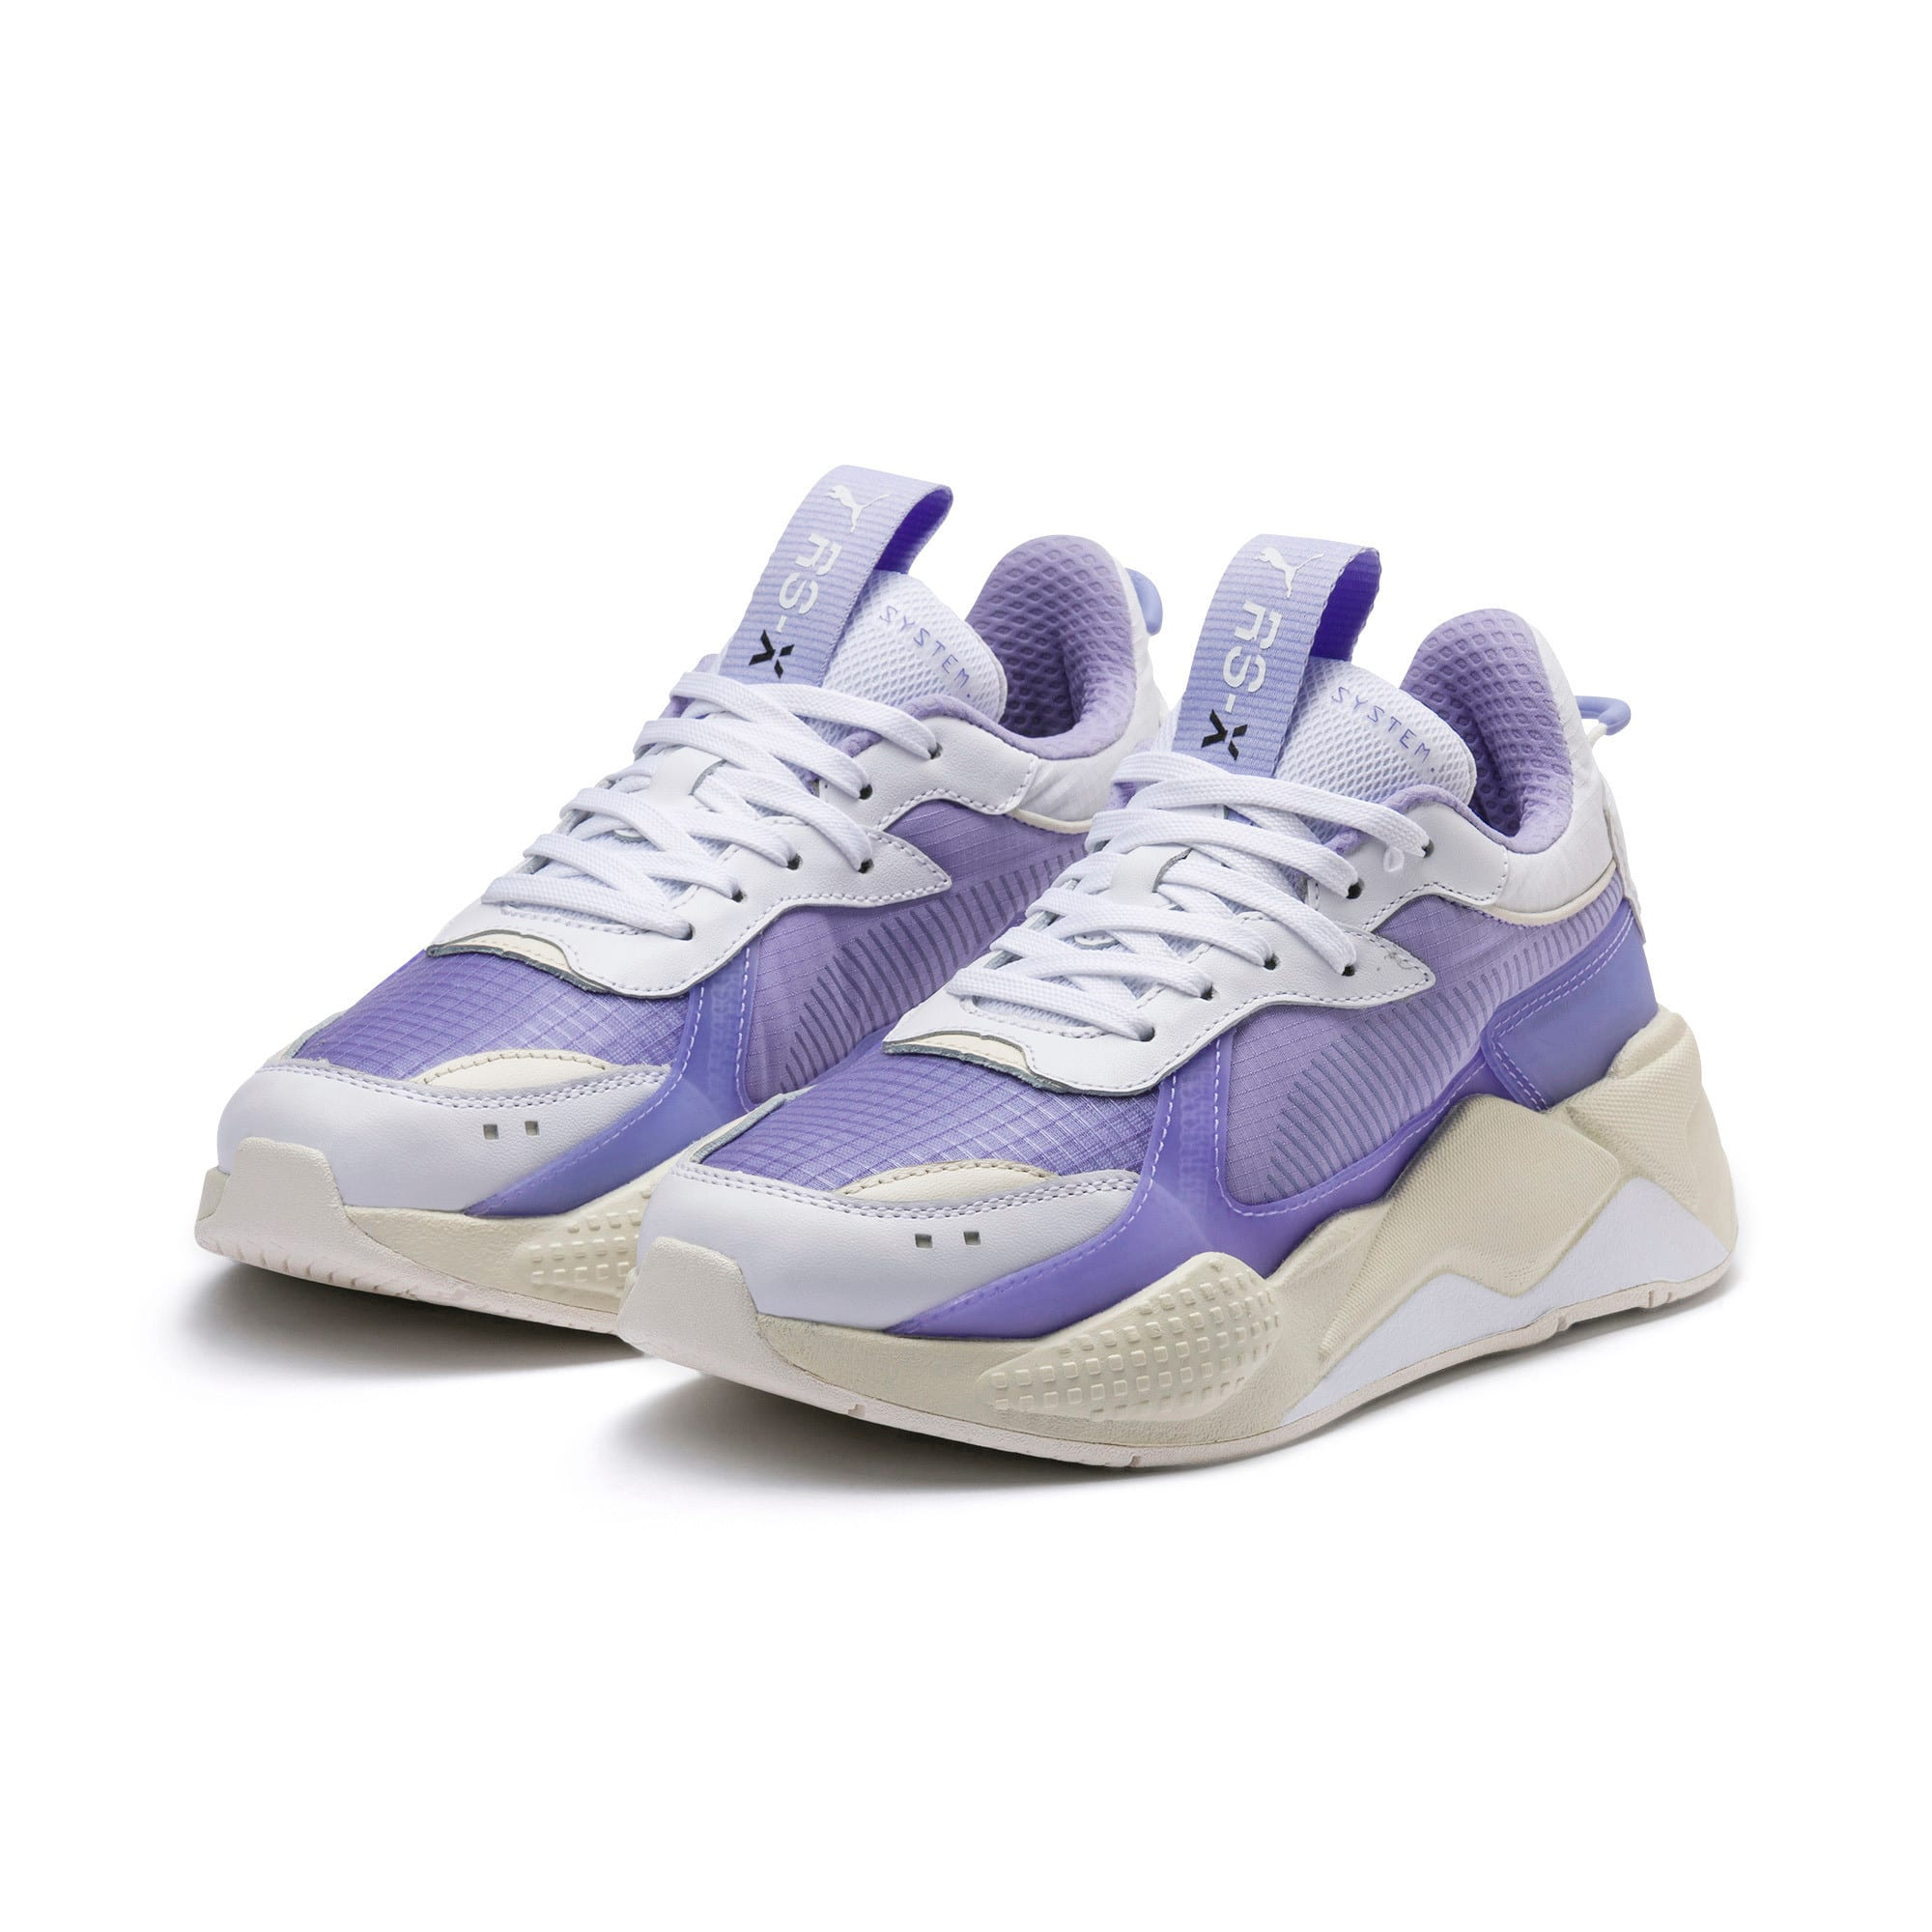 Thumbnail 2 of RS-X Tech Sneaker, Puma White-Sweet Lavender, medium